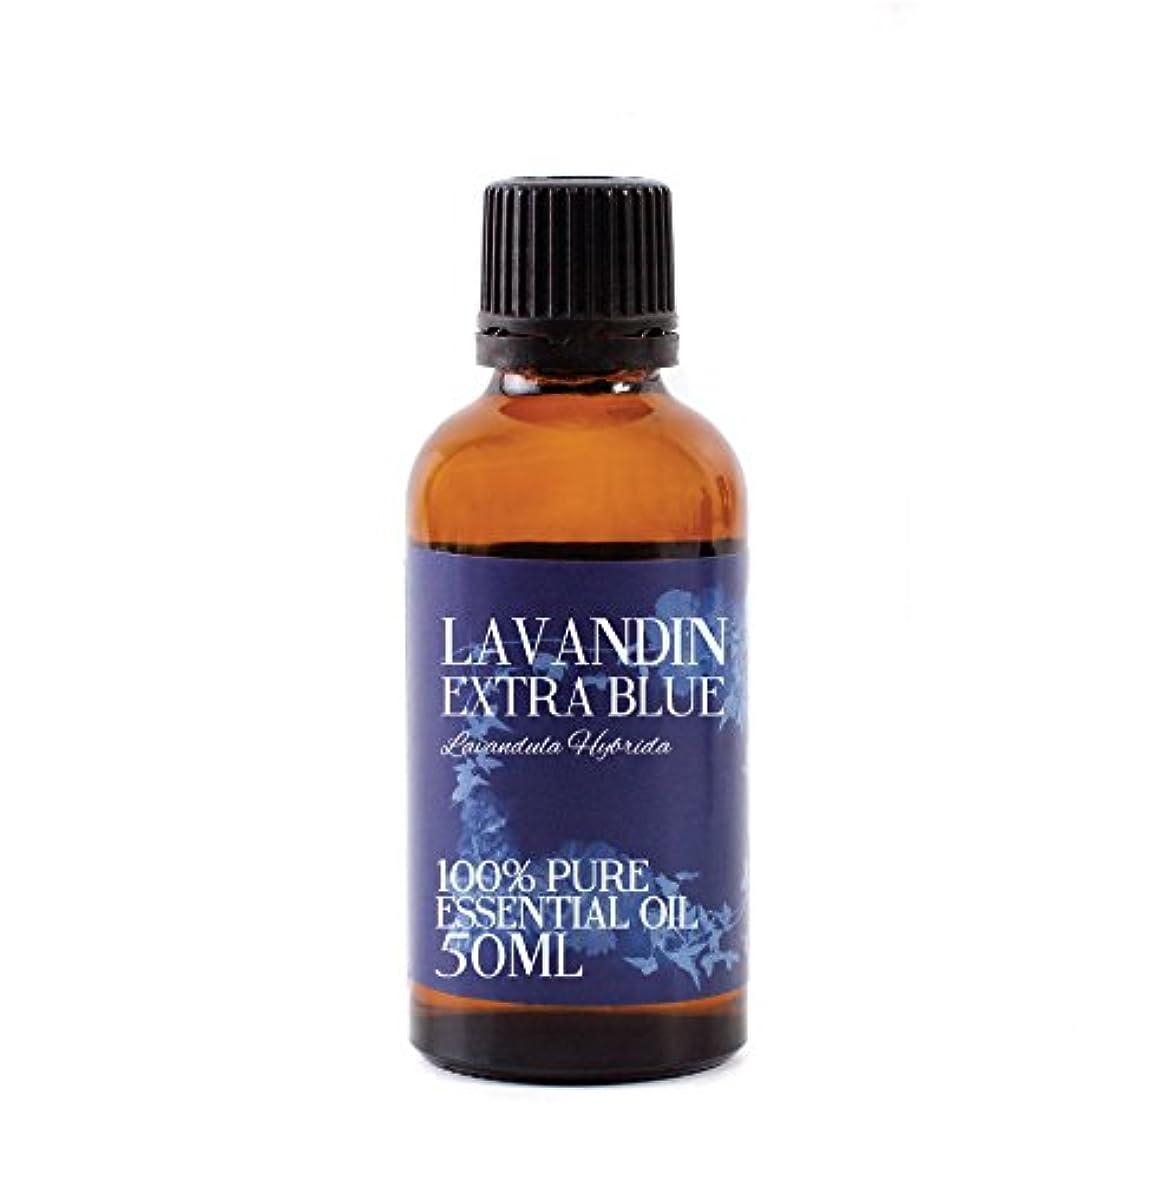 週間野心的学生Mystic Moments | Lavandin Extra Blue Essential Oil - 50ml - 100% Pure